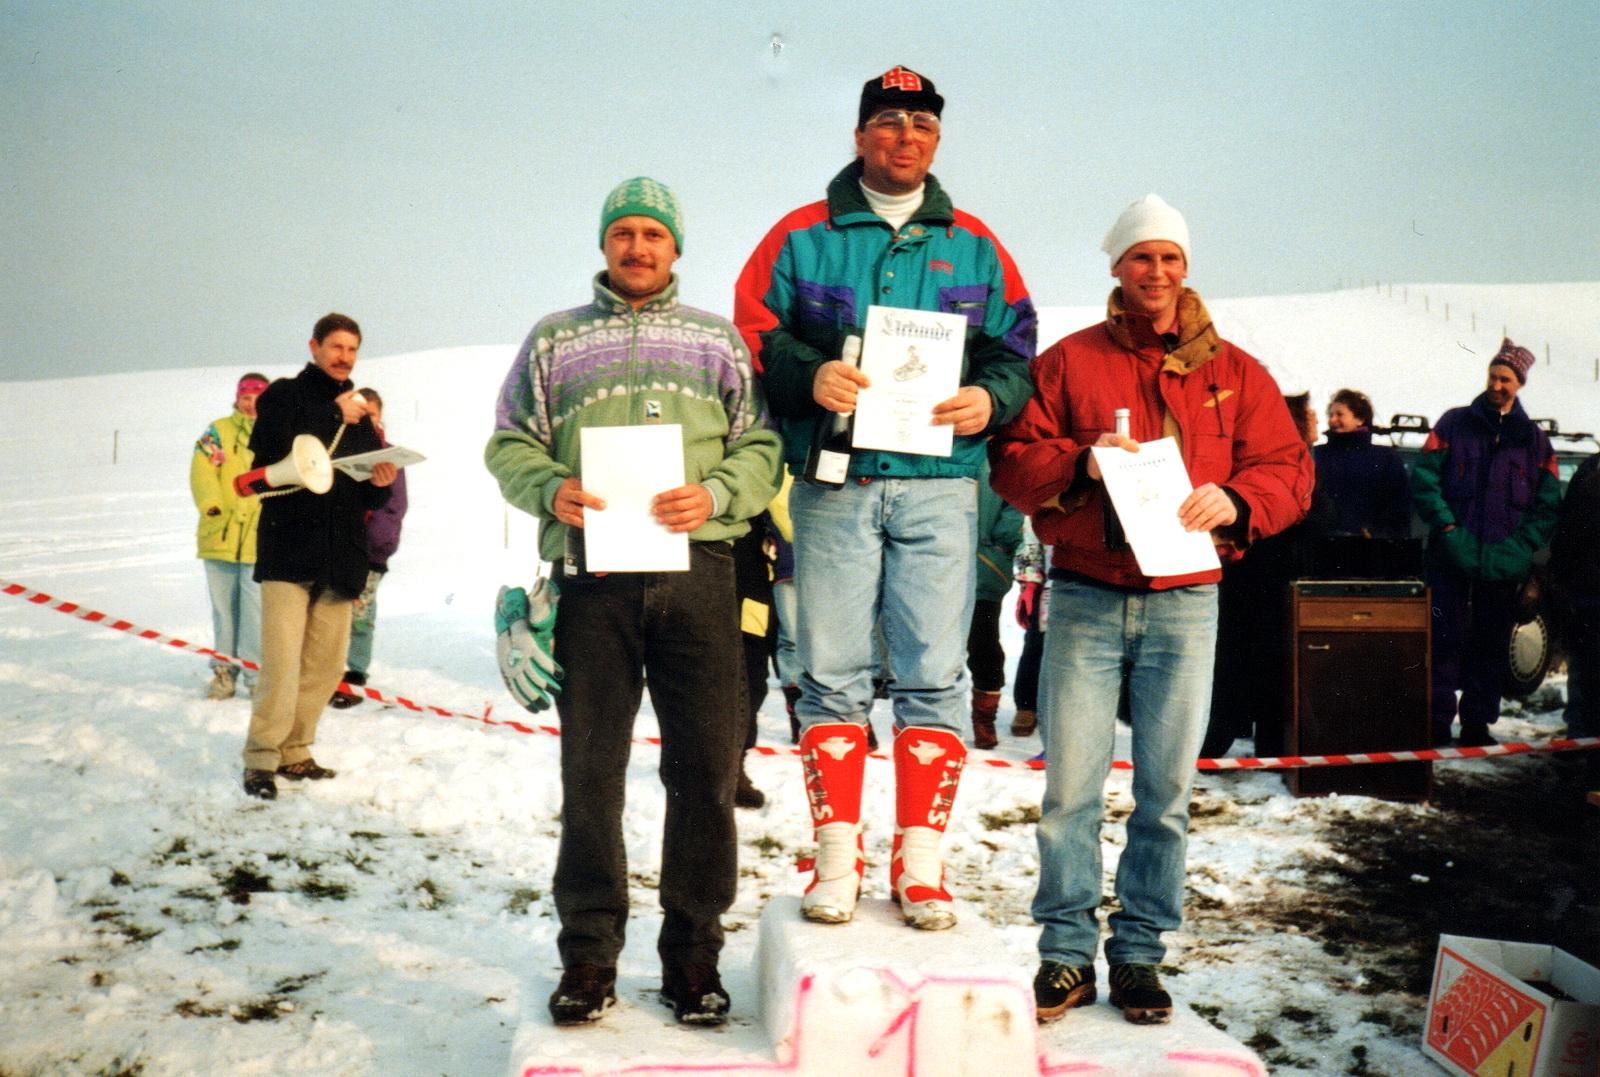 Andreas Heißerer (2. Platz); Helmut Wörle (1. Platz); Ludwig Sieber (3. Platz)